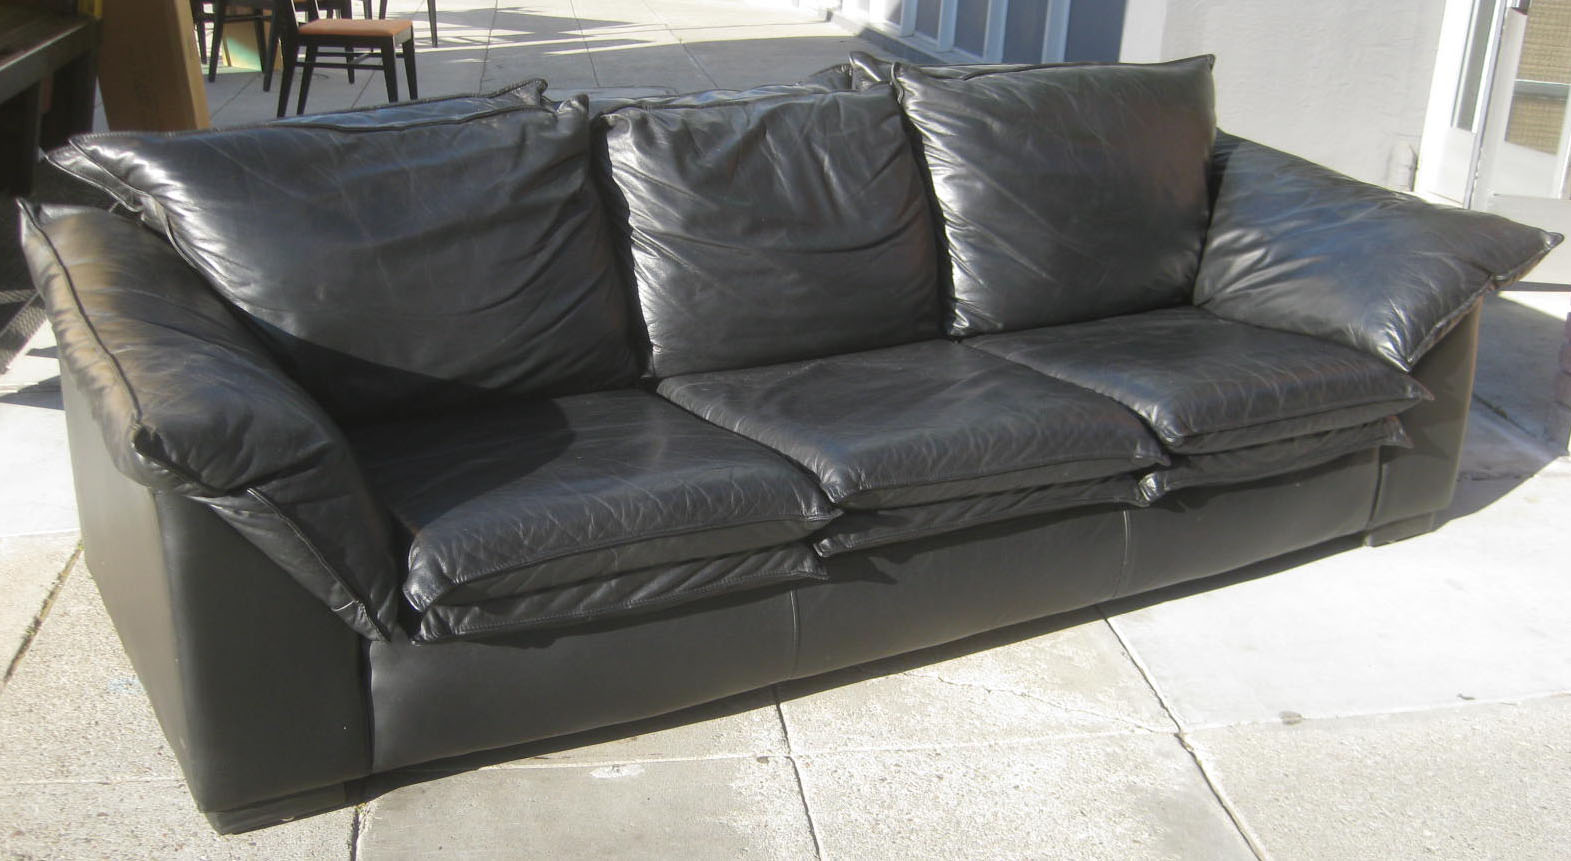 black leather sofa 1 osobowa z funkcja spania agata meble uhuru furniture and collectibles sold